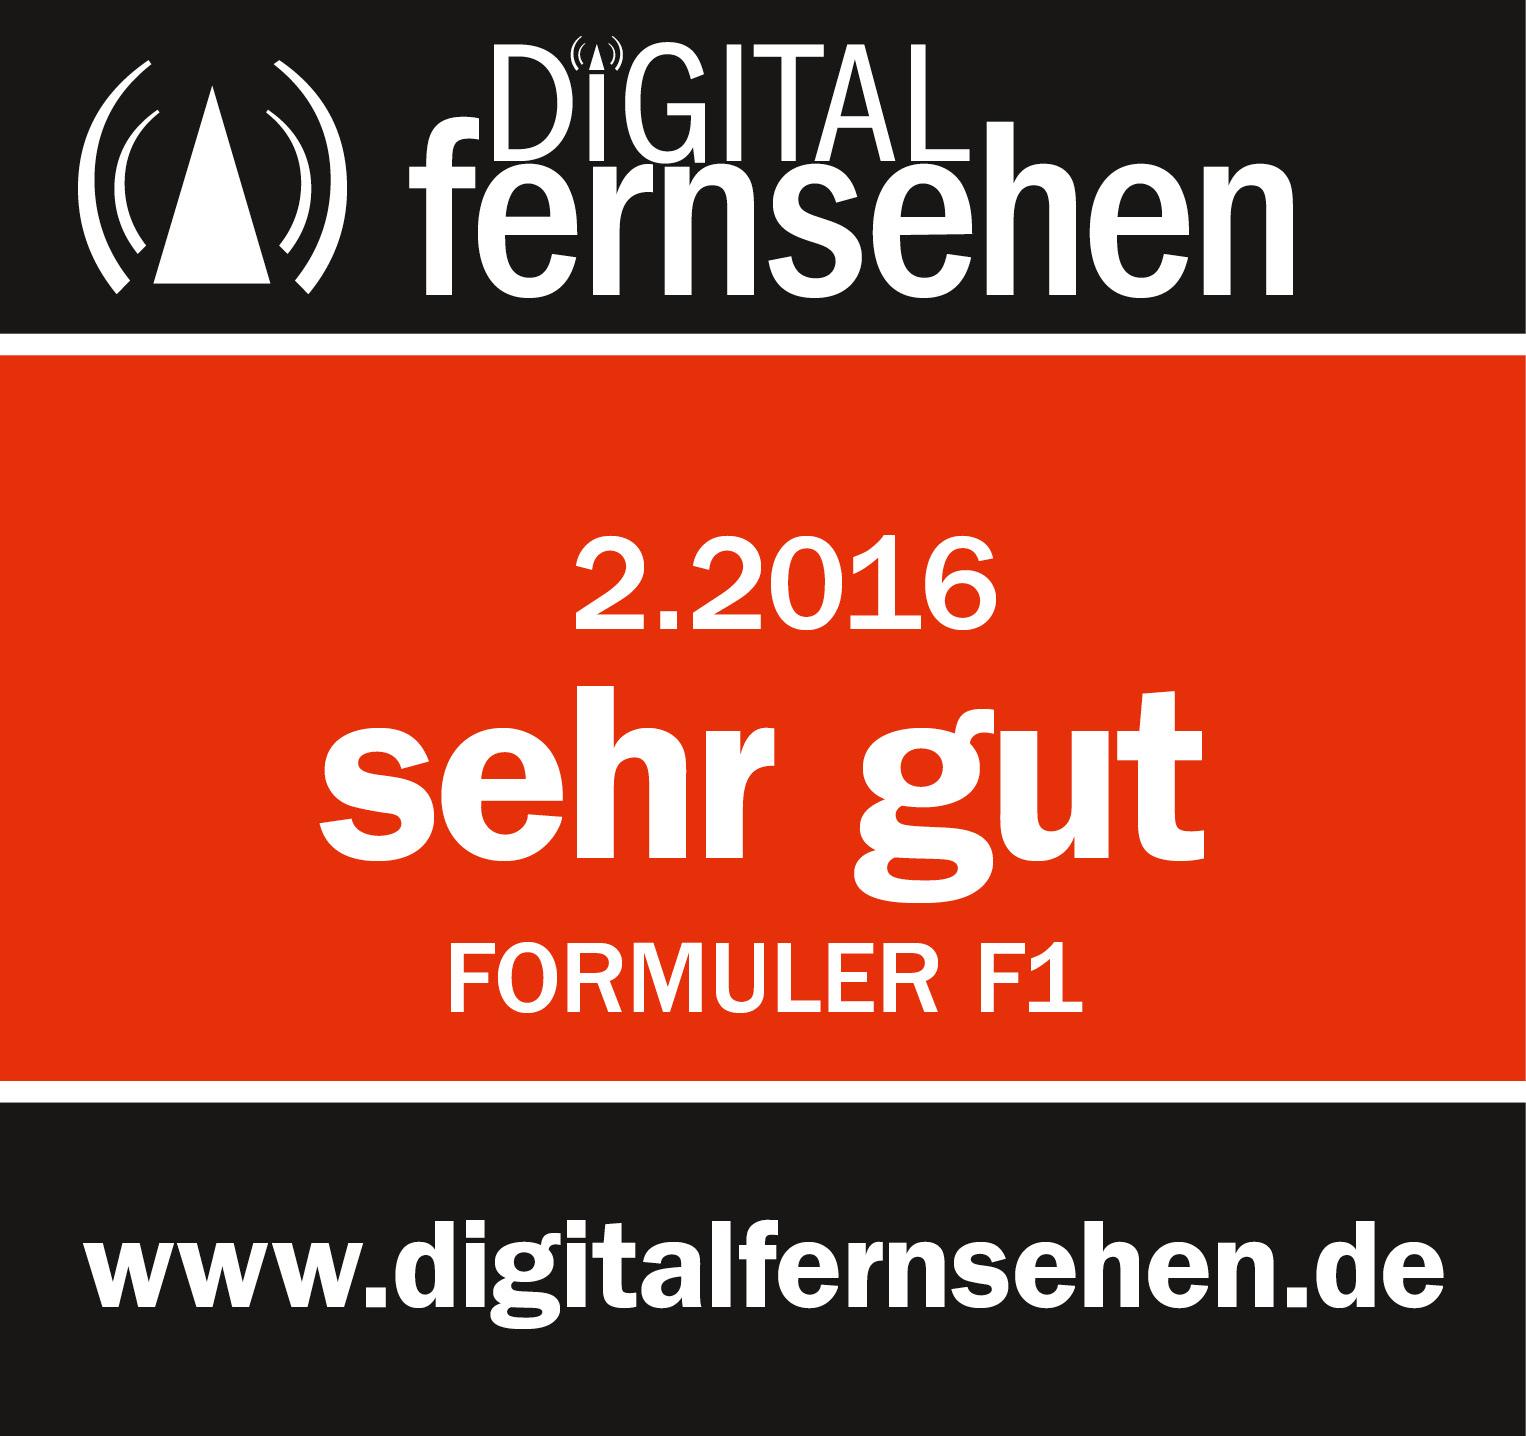 FormulerF1-DF-SEHRGUT-HQ